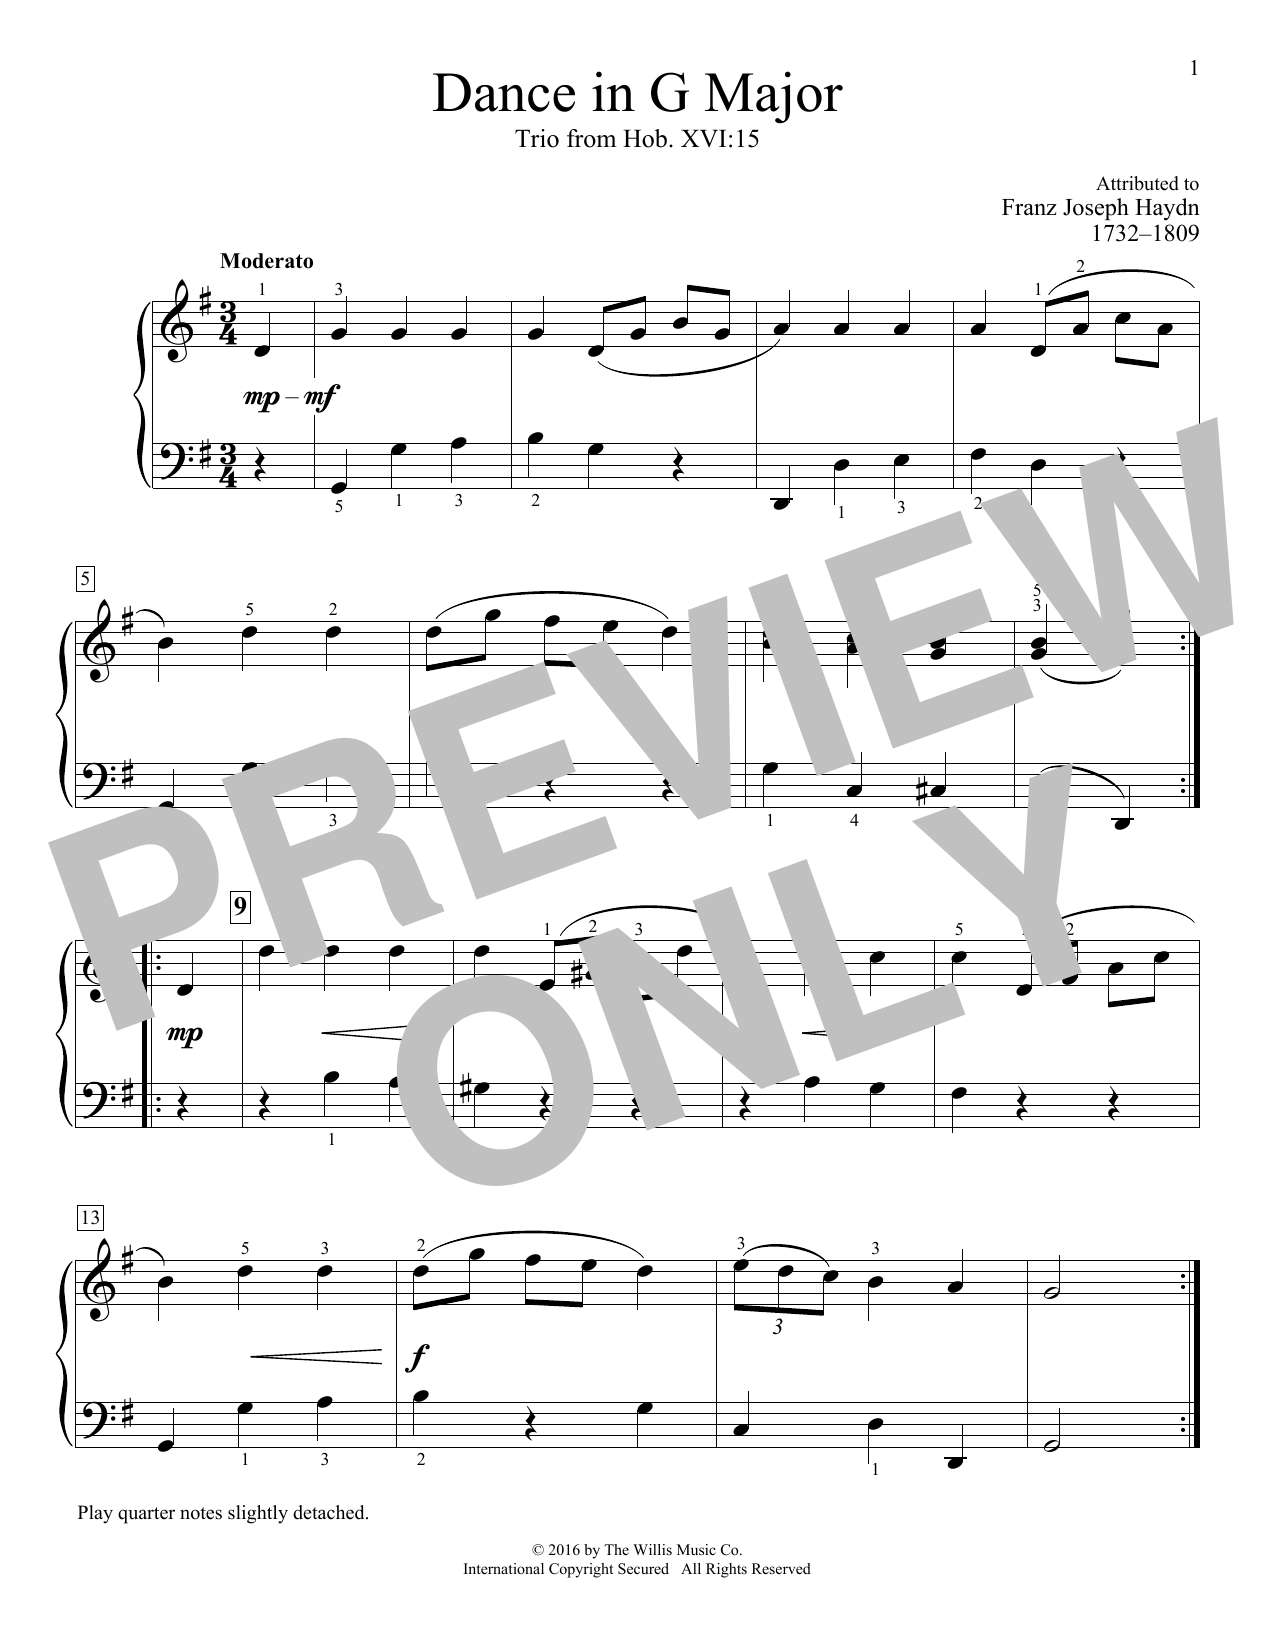 Dance In G Major, Trio from Hob. XVI:15 Sheet Music